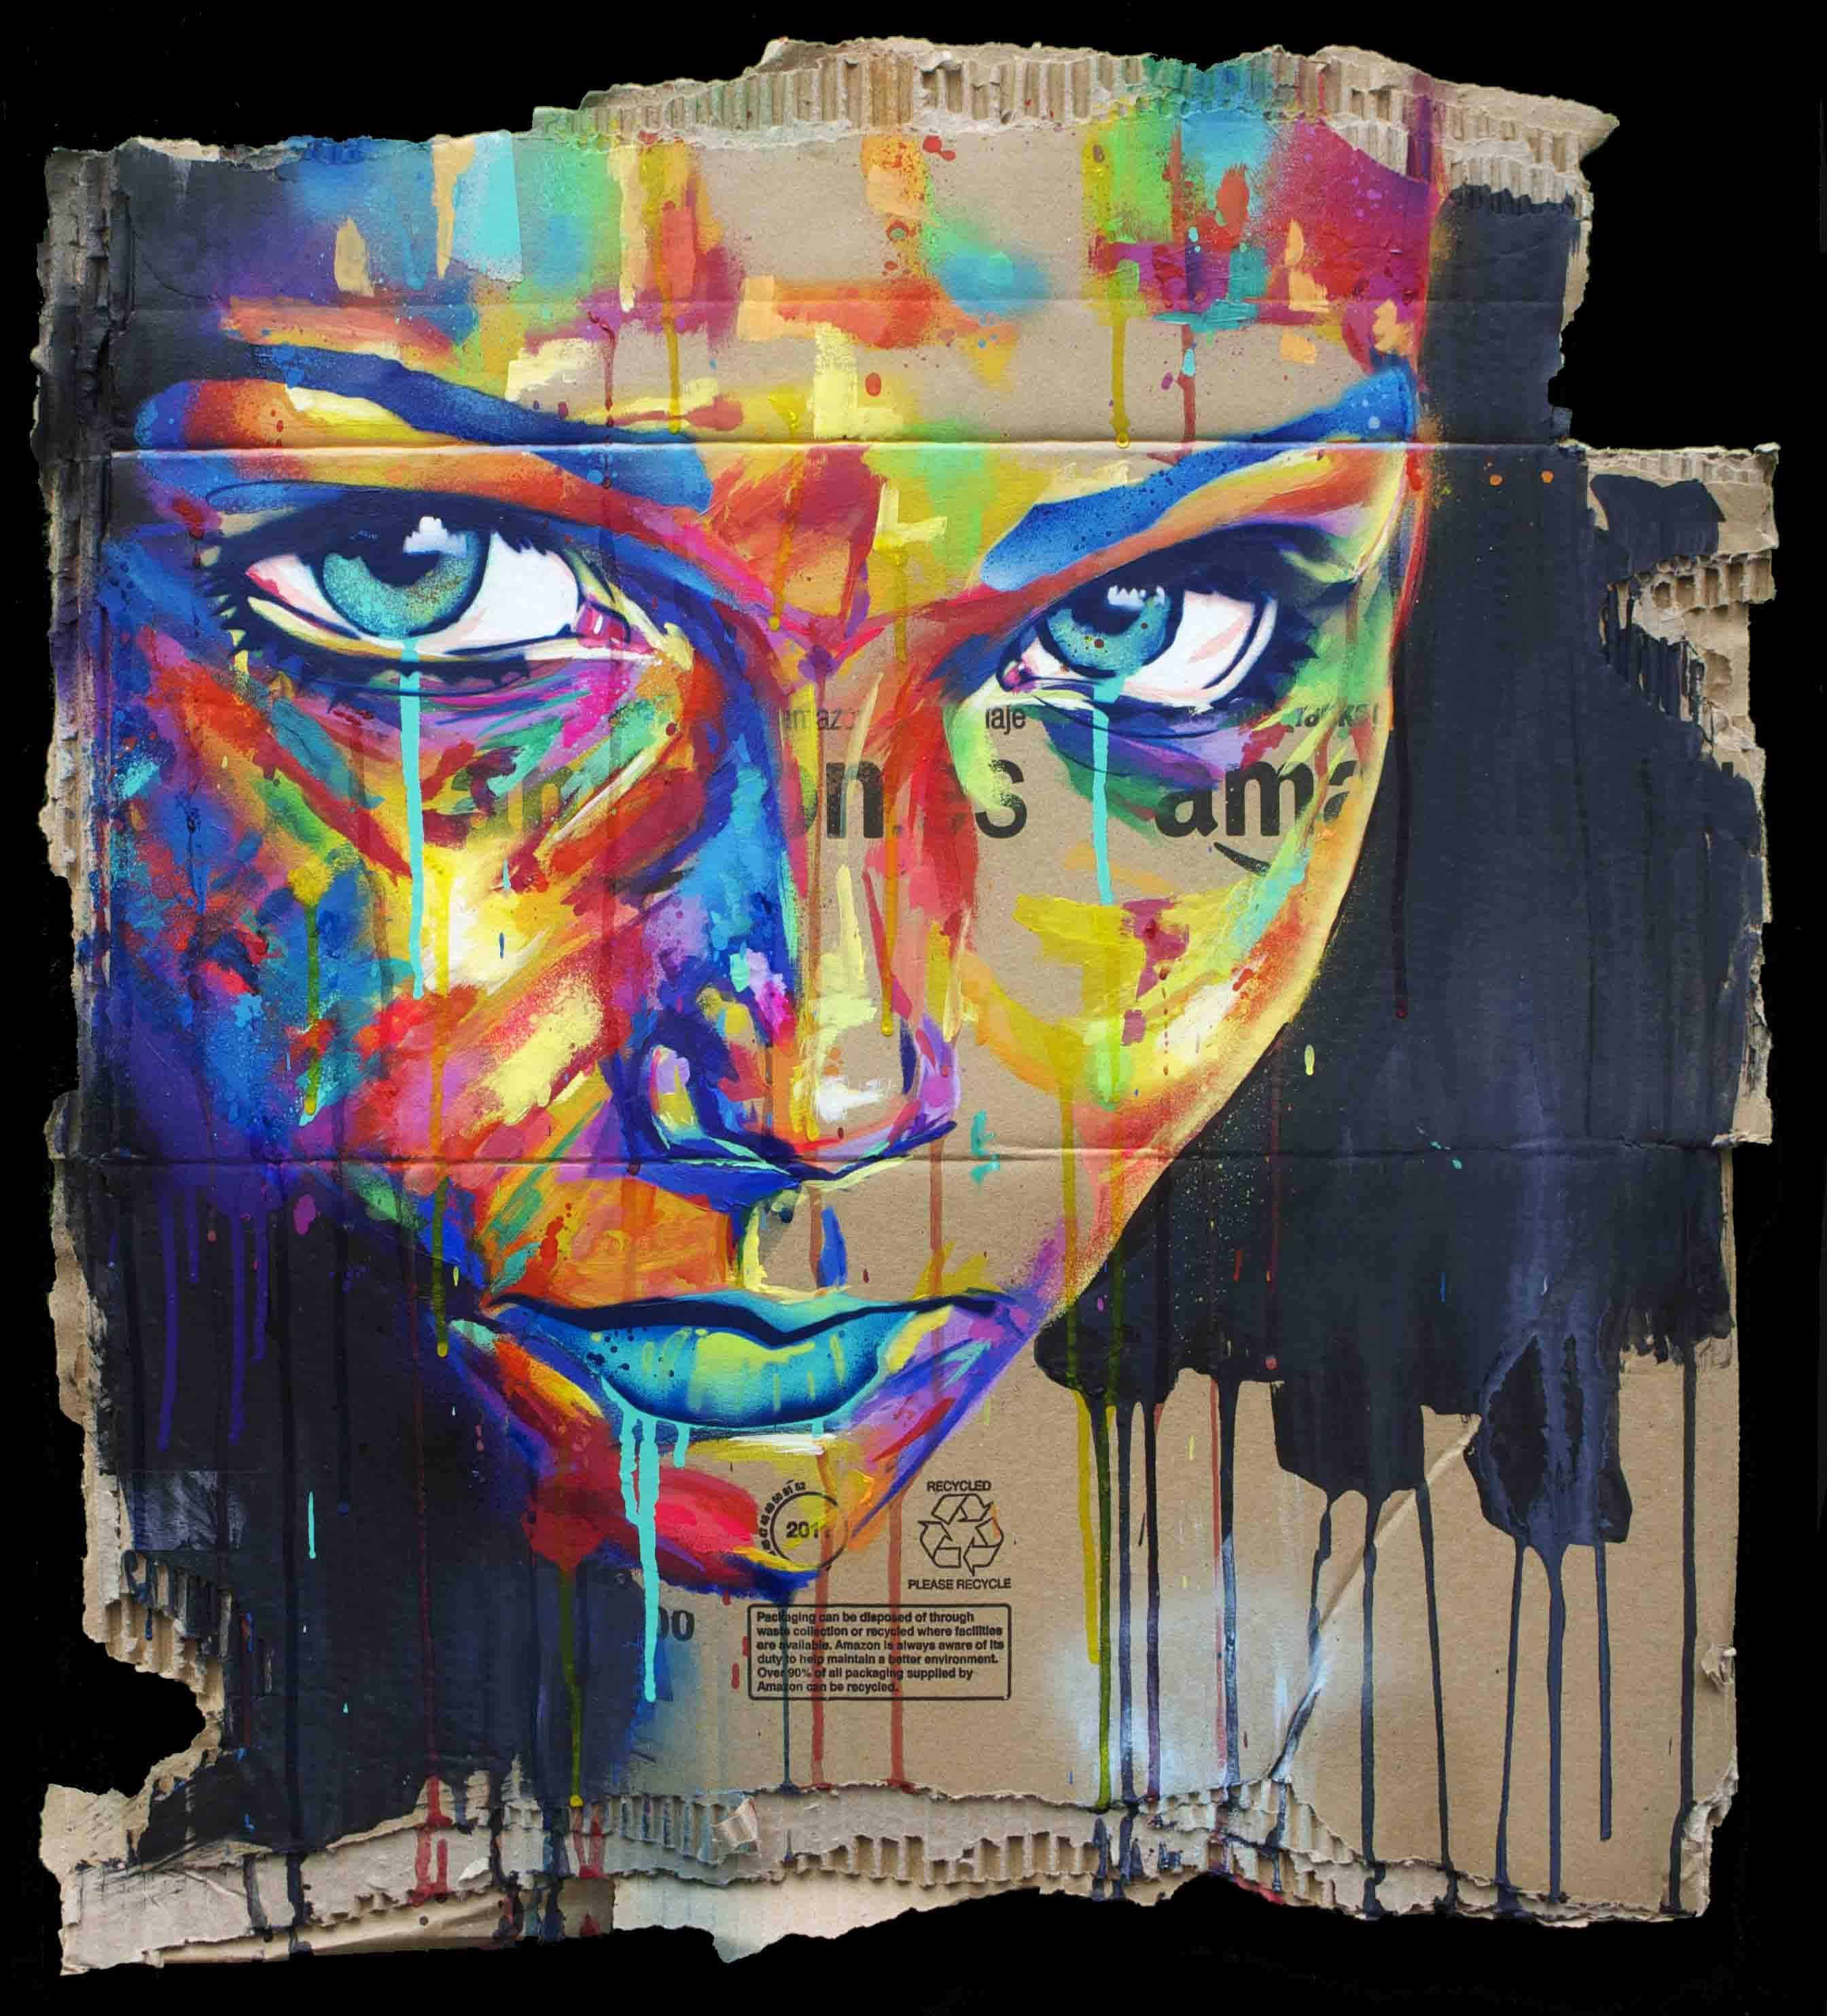 Insightful spray paint art spray painting painting art portrait images portraits